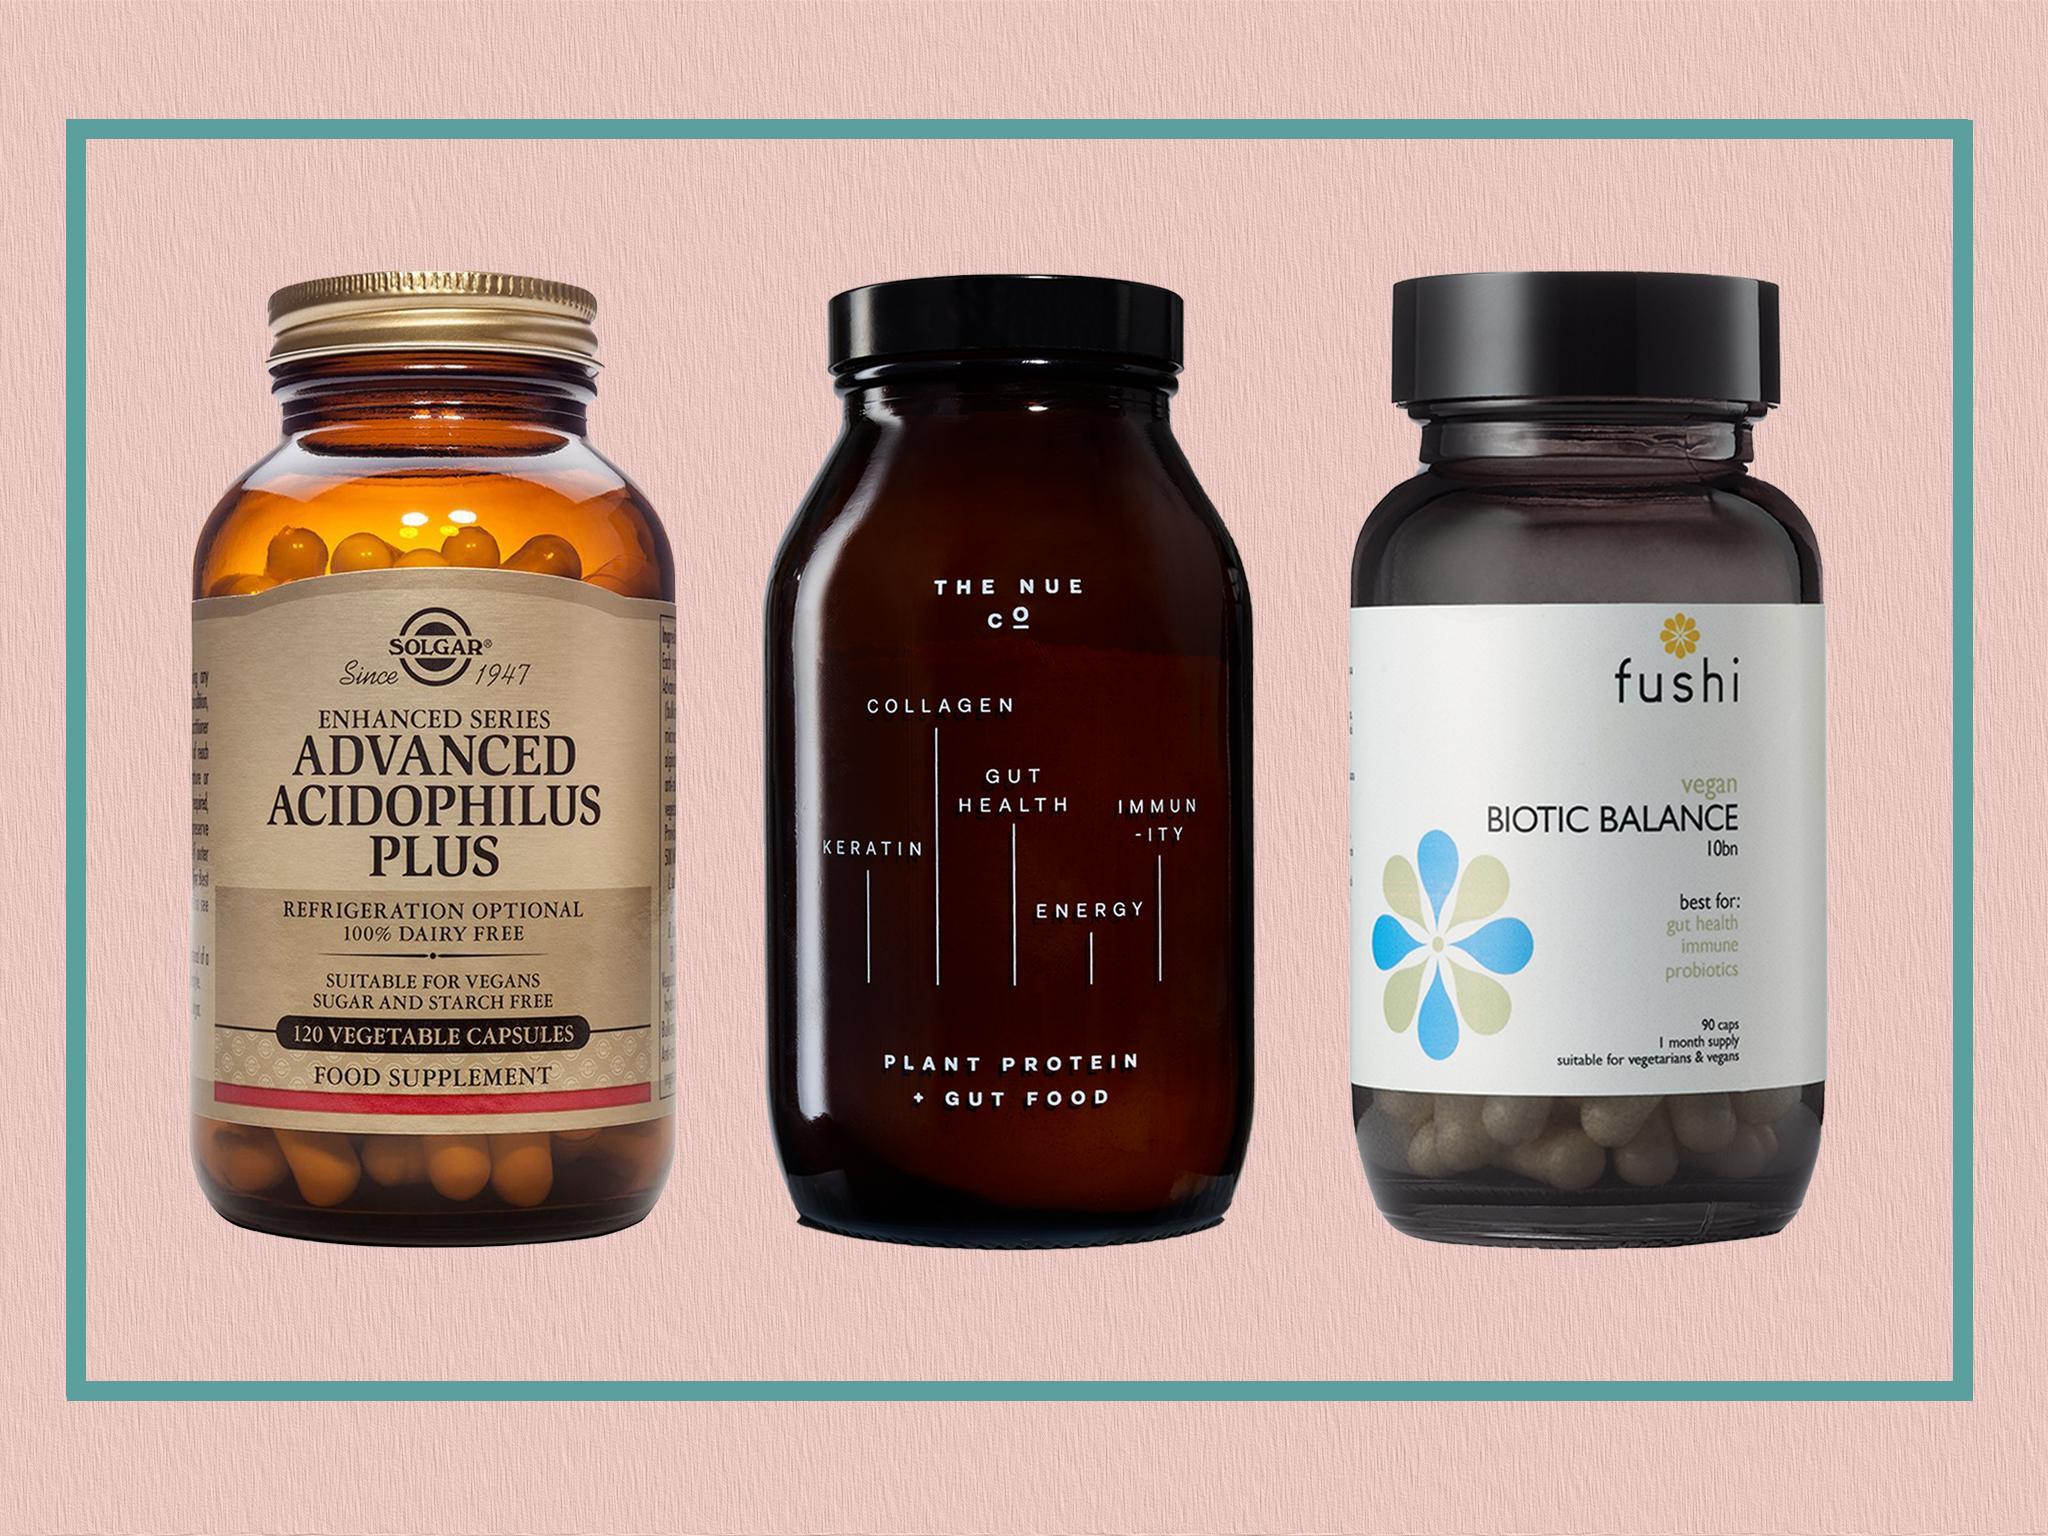 Best prebiotic and probiotic supplements to help improve gut health